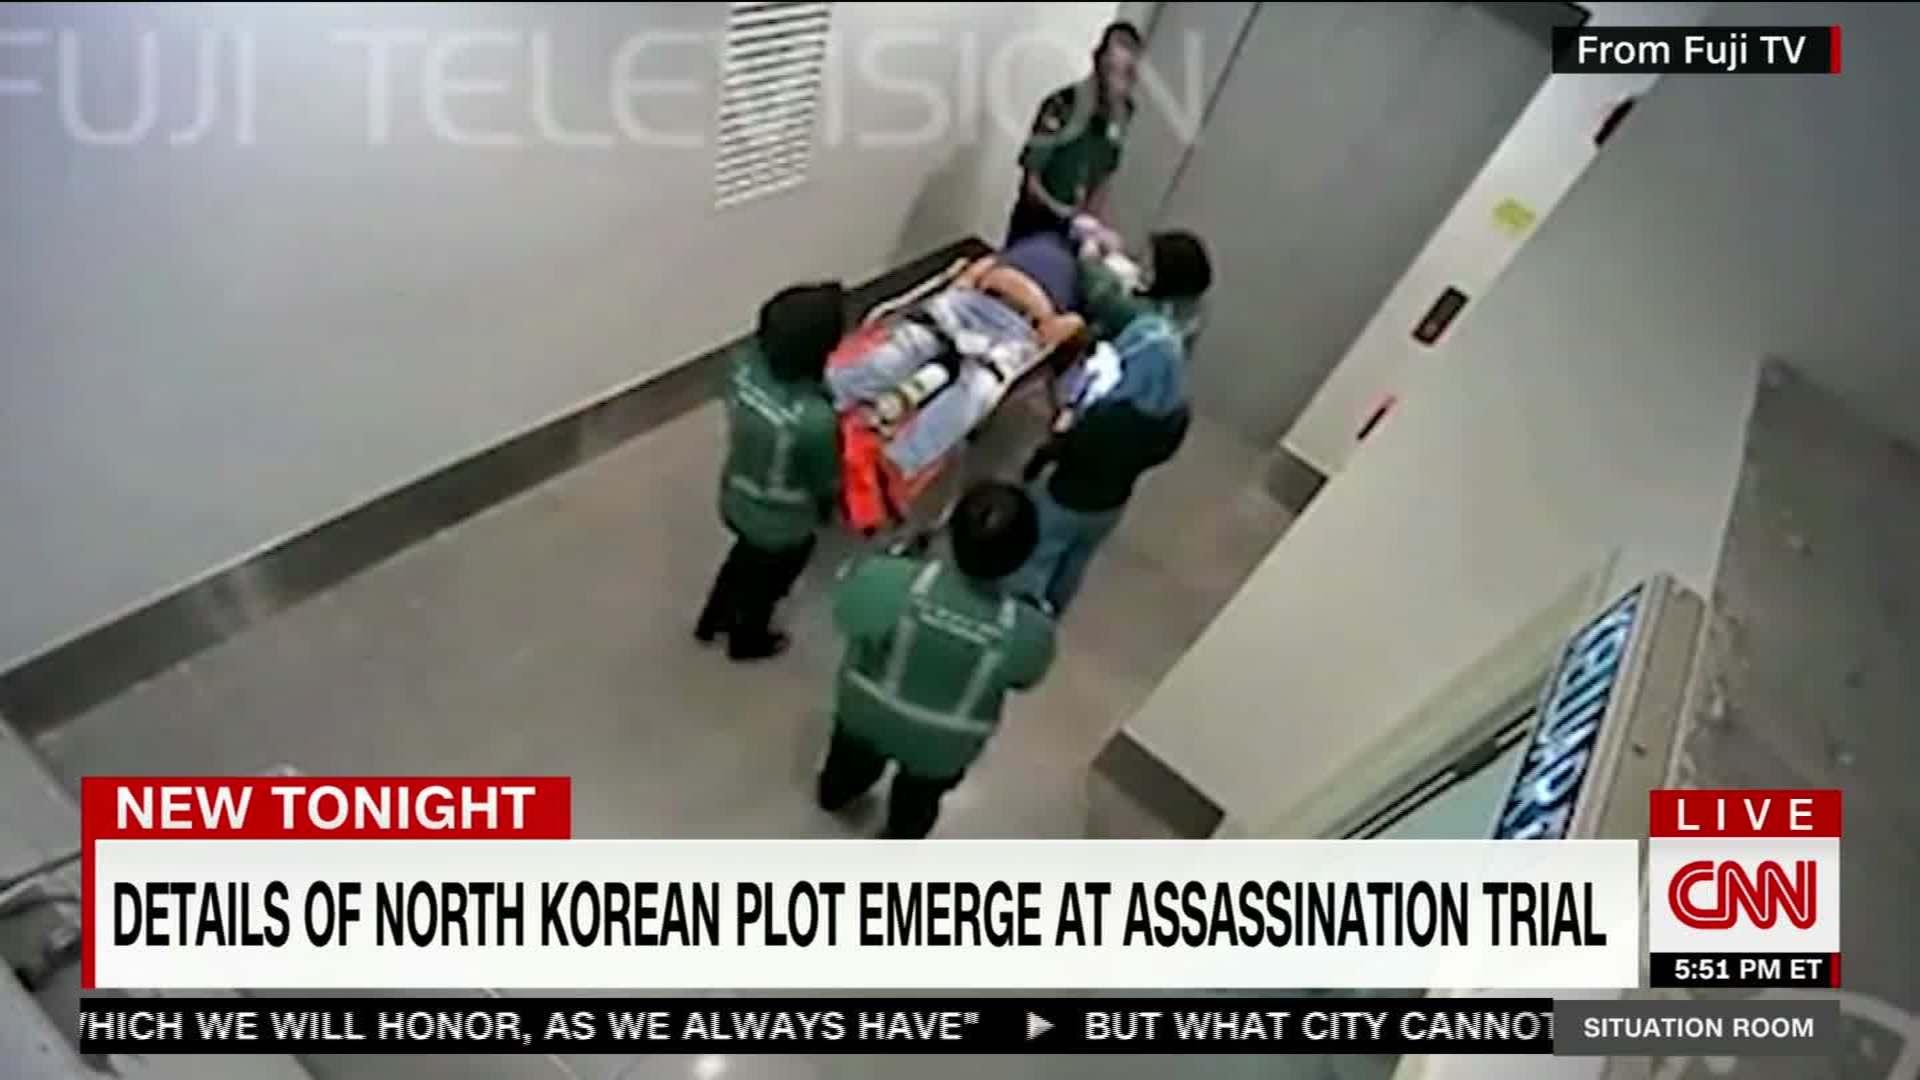 N. Korea Assassination Case Cited In Sanctions   CNN Video Part 55